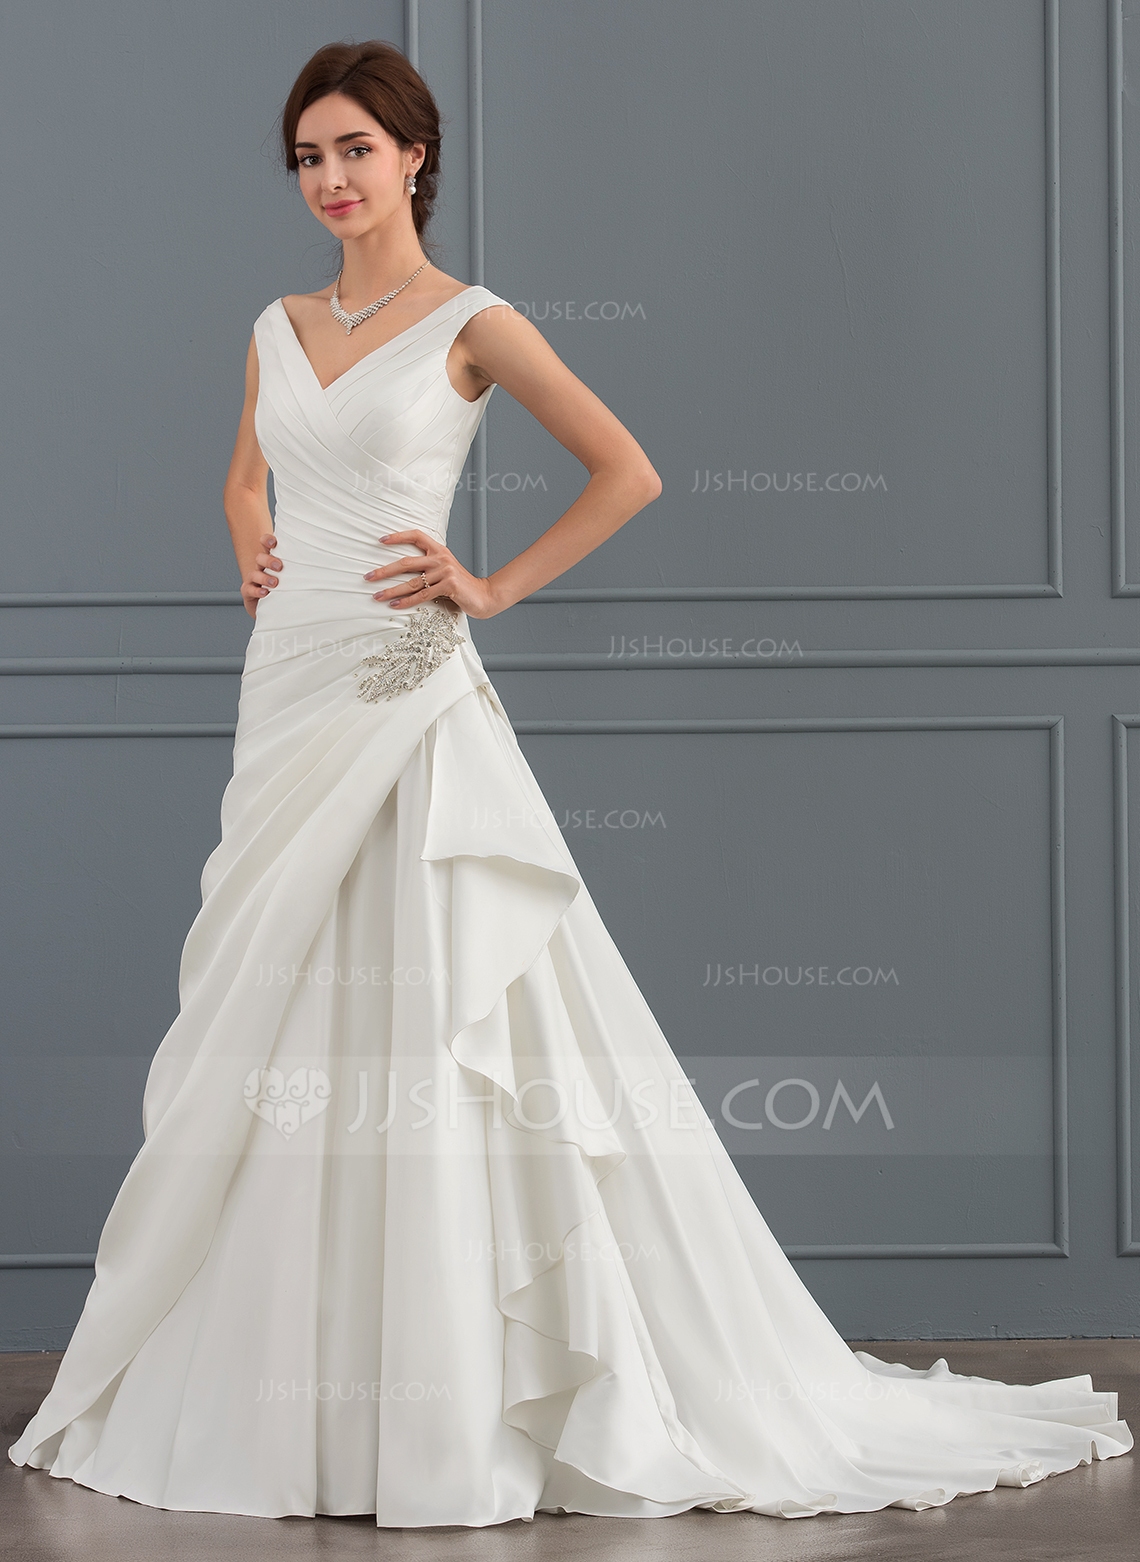 jjshouse short wedding dresses photo - 1